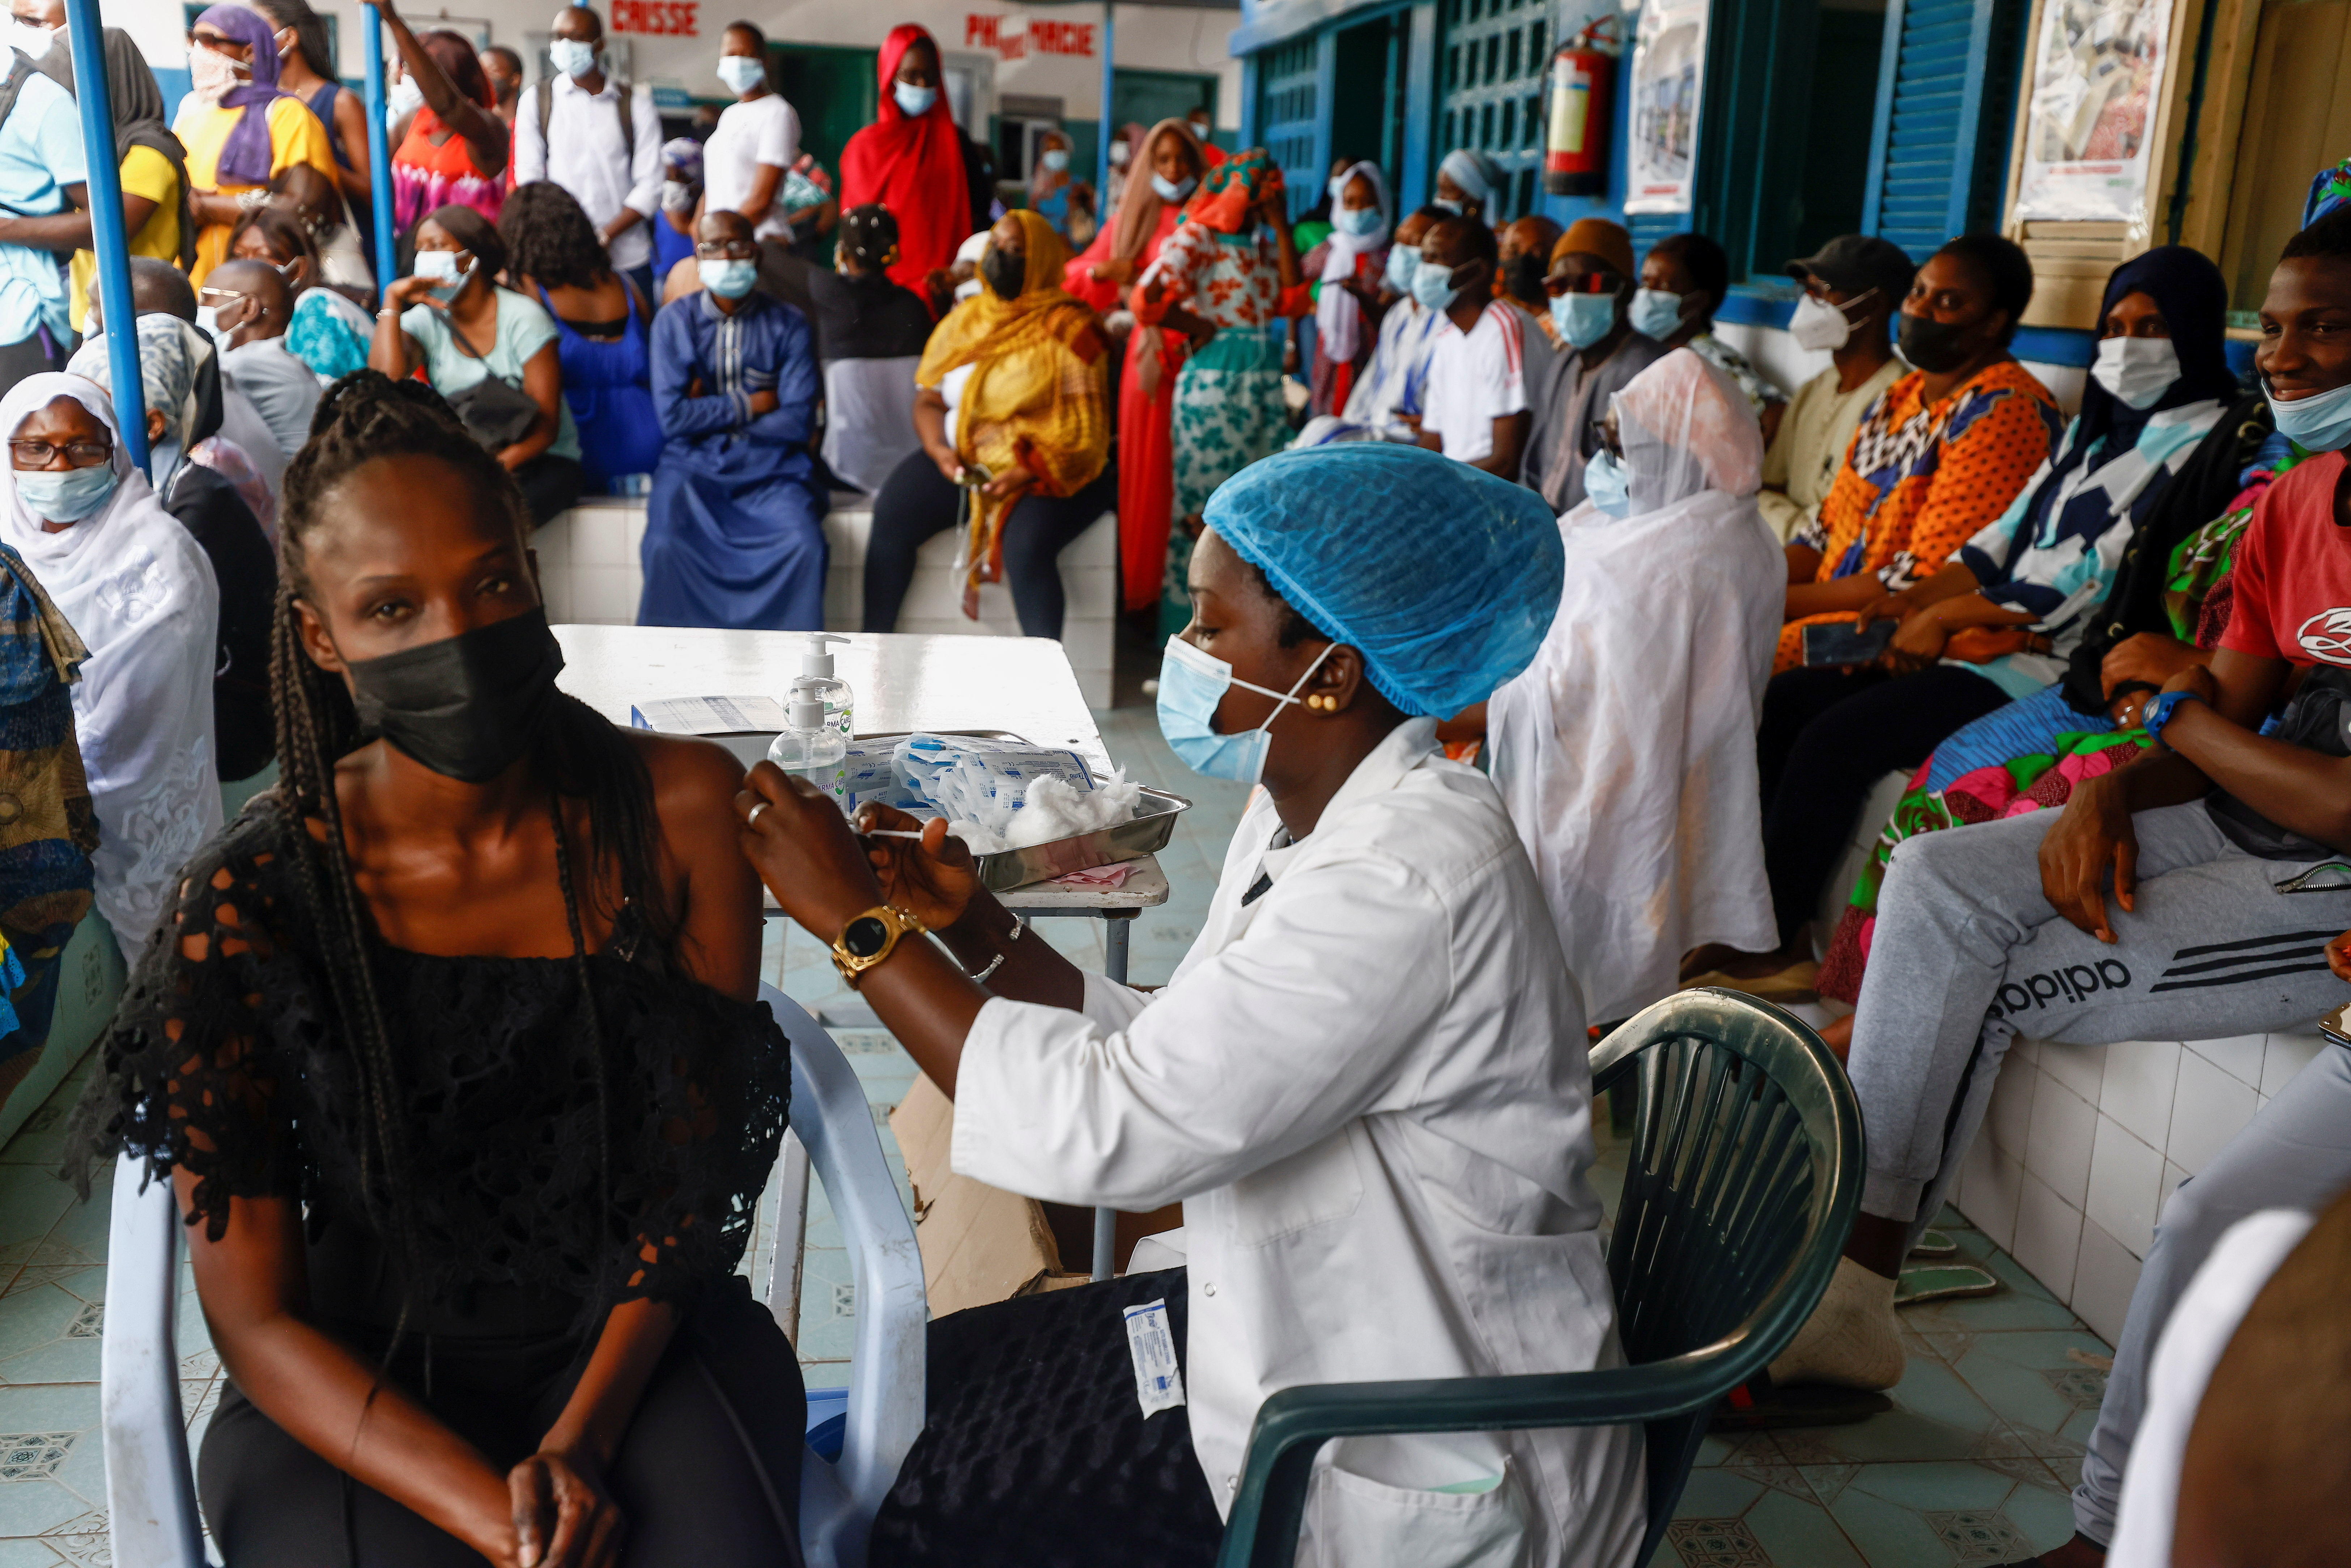 Aminata Laye Diagne, a nurse gives a dose of coronavirus disease (COVID-19) vaccine to a woman at Philippe Senghor Hospital  in Dakar, amid a surge of coronavirus disease (COVID-19) cases in Senegal July 28, 2021. Picture taken July 28, 2021.